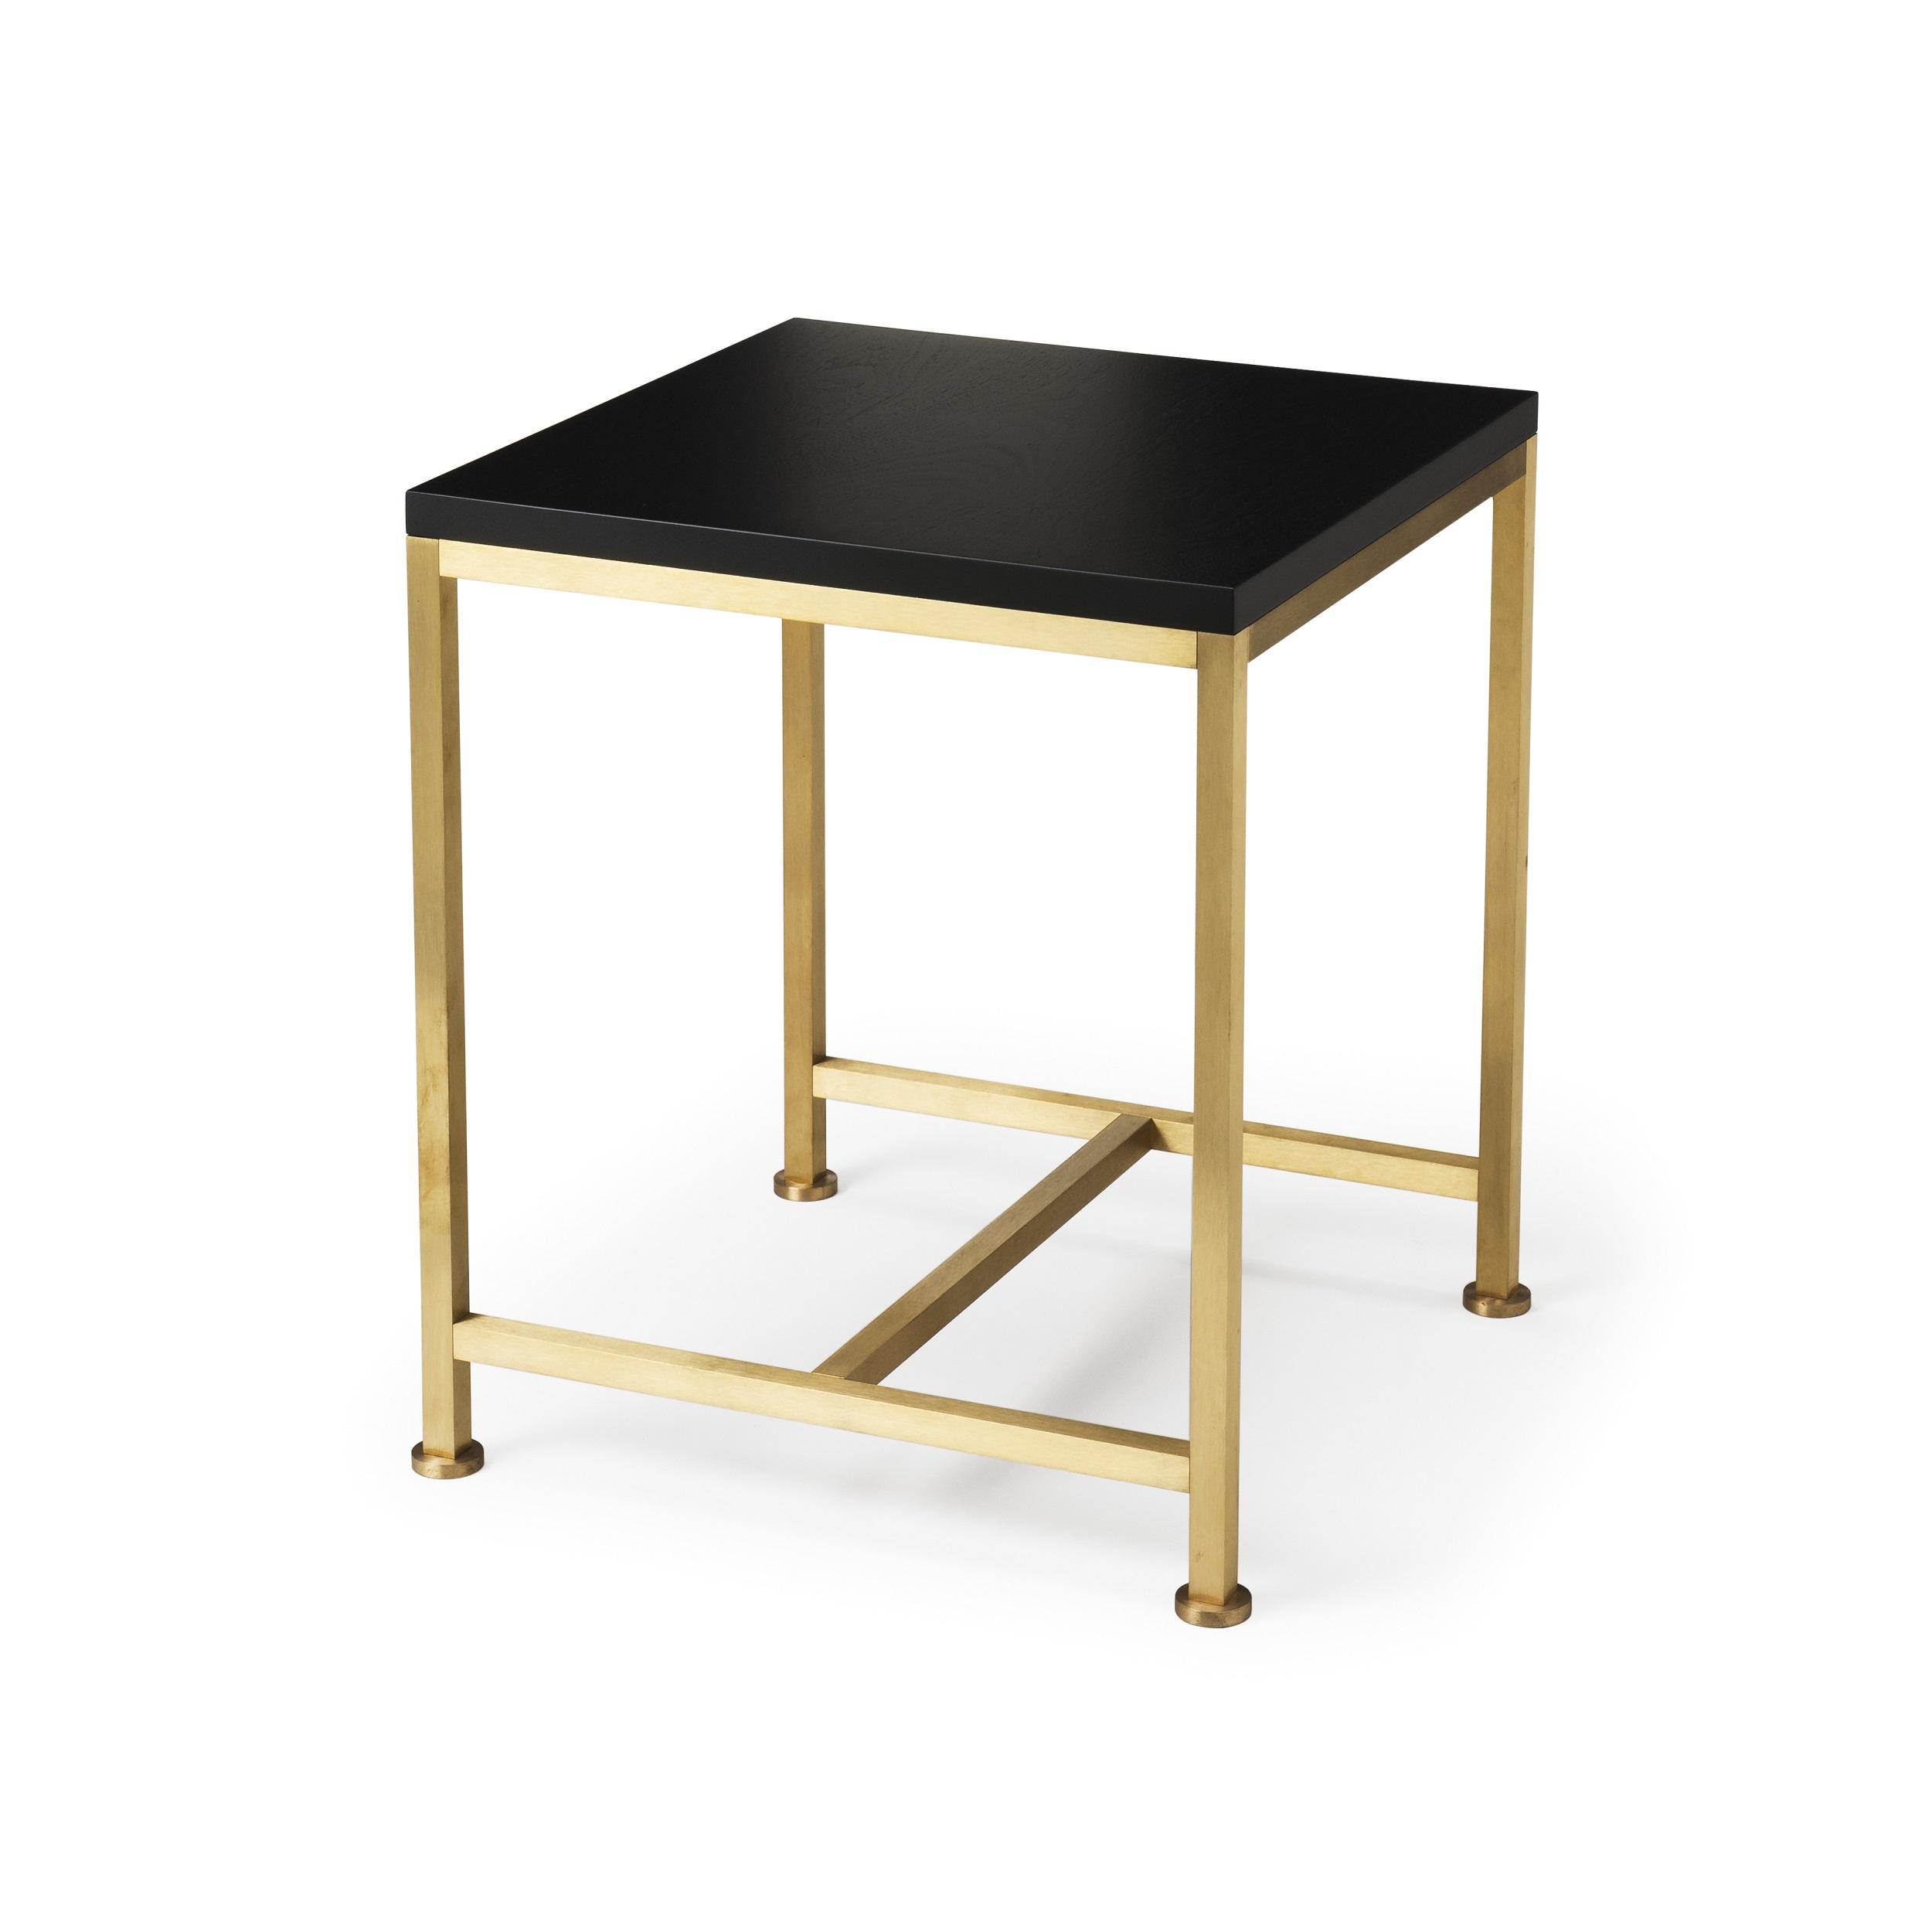 ORICHAL COFFEE TABLE_STUART SCOTT (2).jpg